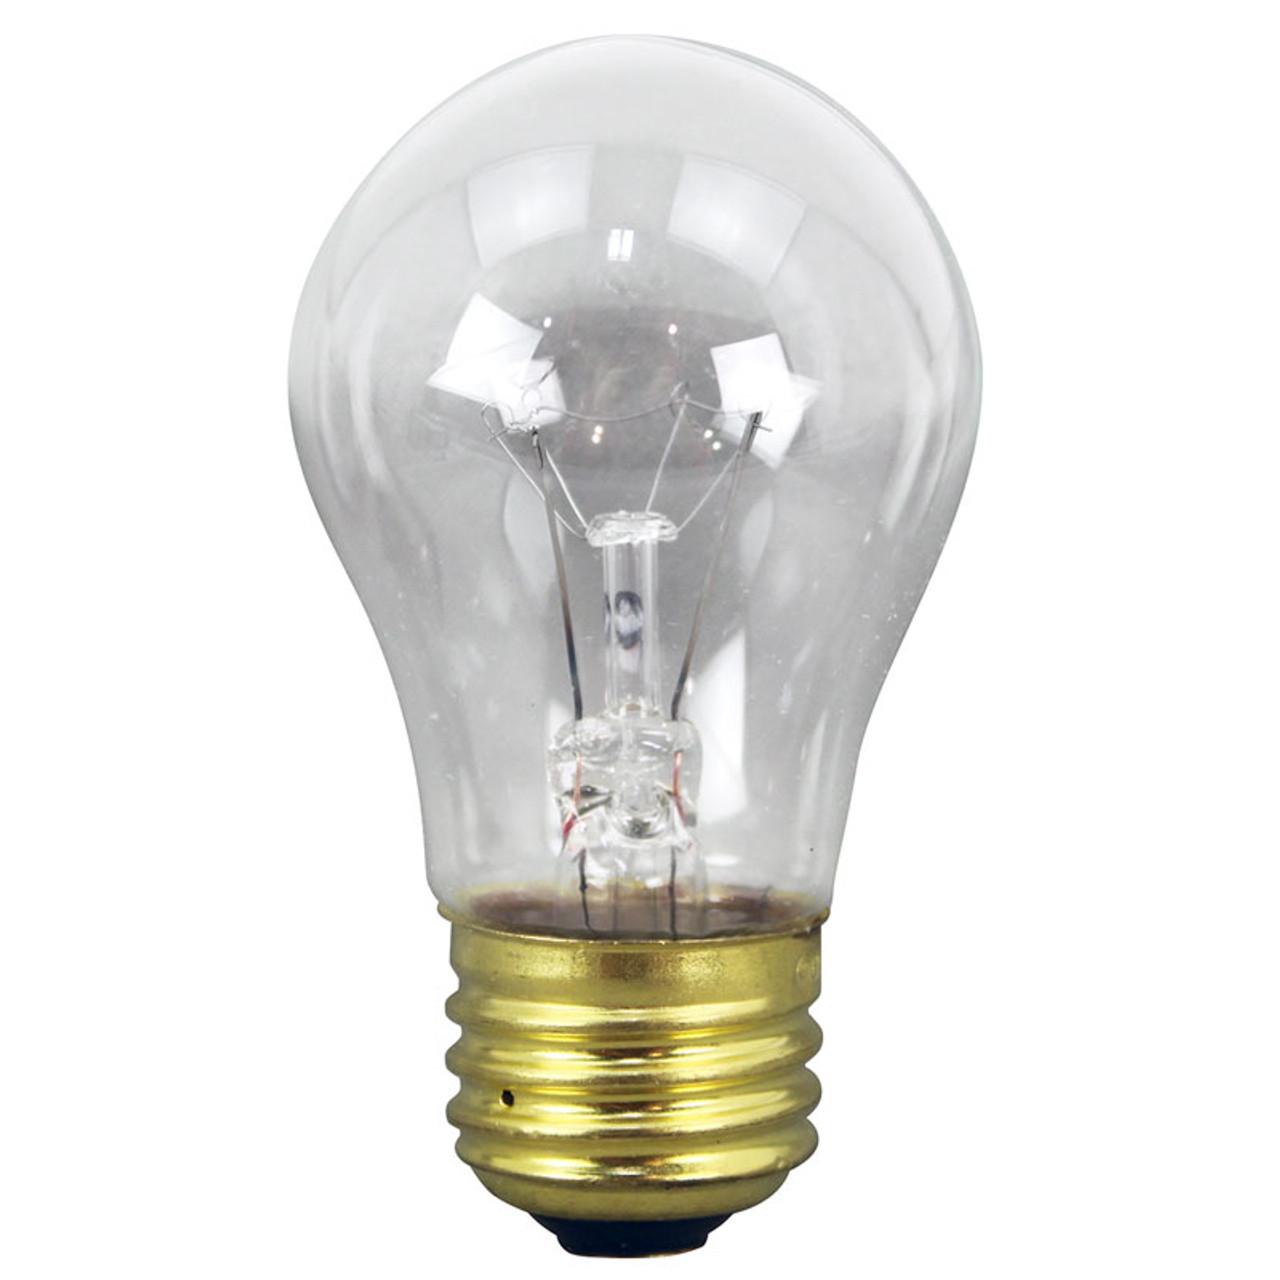 Fusion - Light Bulb - 40w - 513-19